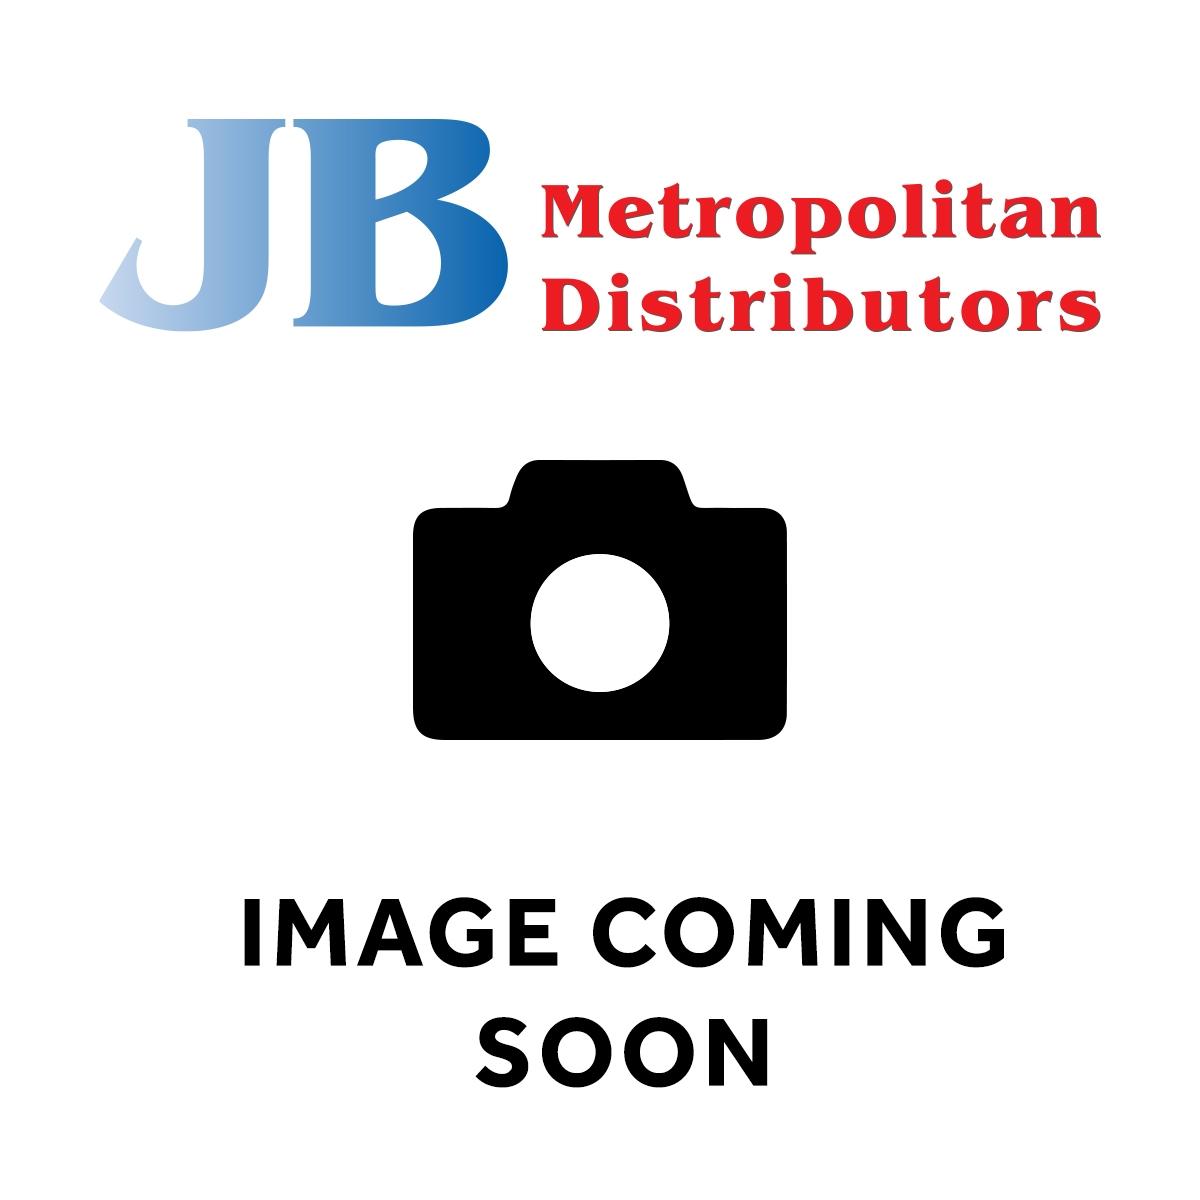 85G JOHN WEST OYSTER SMOKE VEG OIL